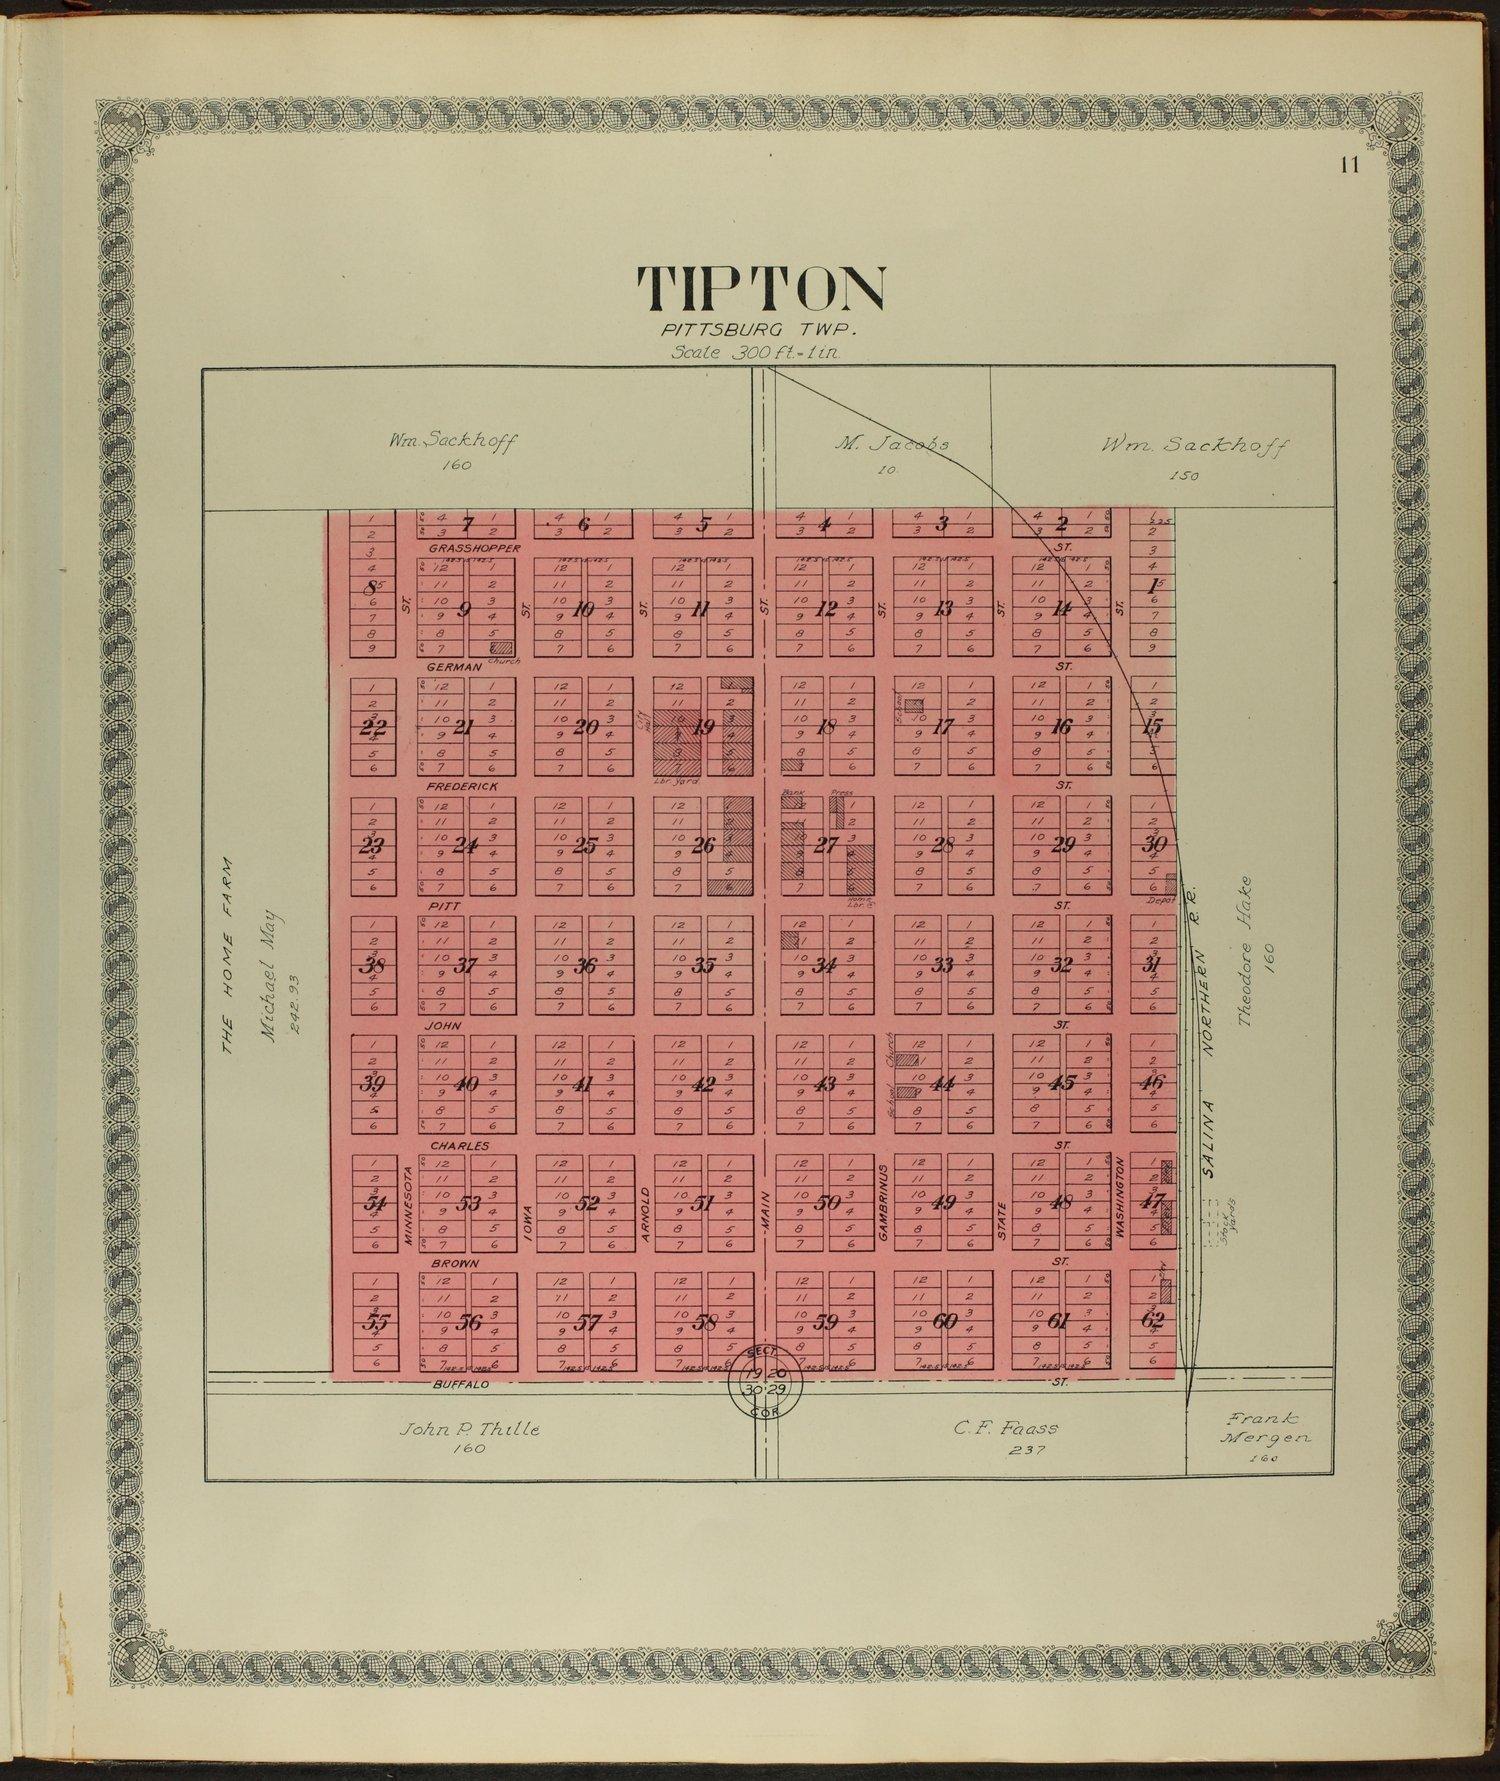 Standard atlas of Mitchell County, Kansas - 11